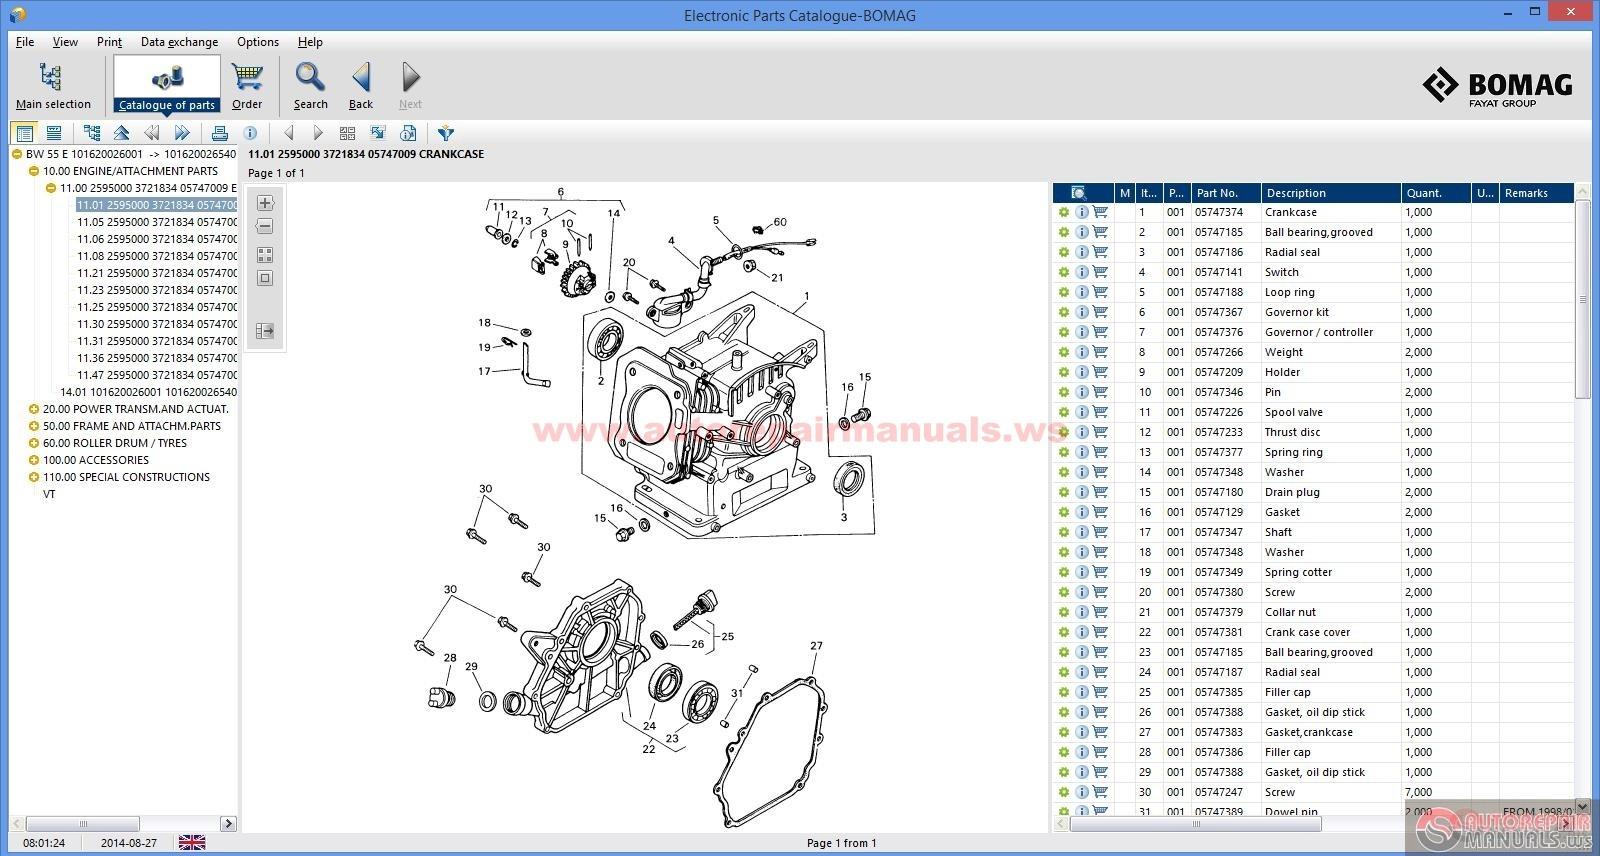 Bomag Electronic Parts Catalogue EPC 2013 Auto Repair